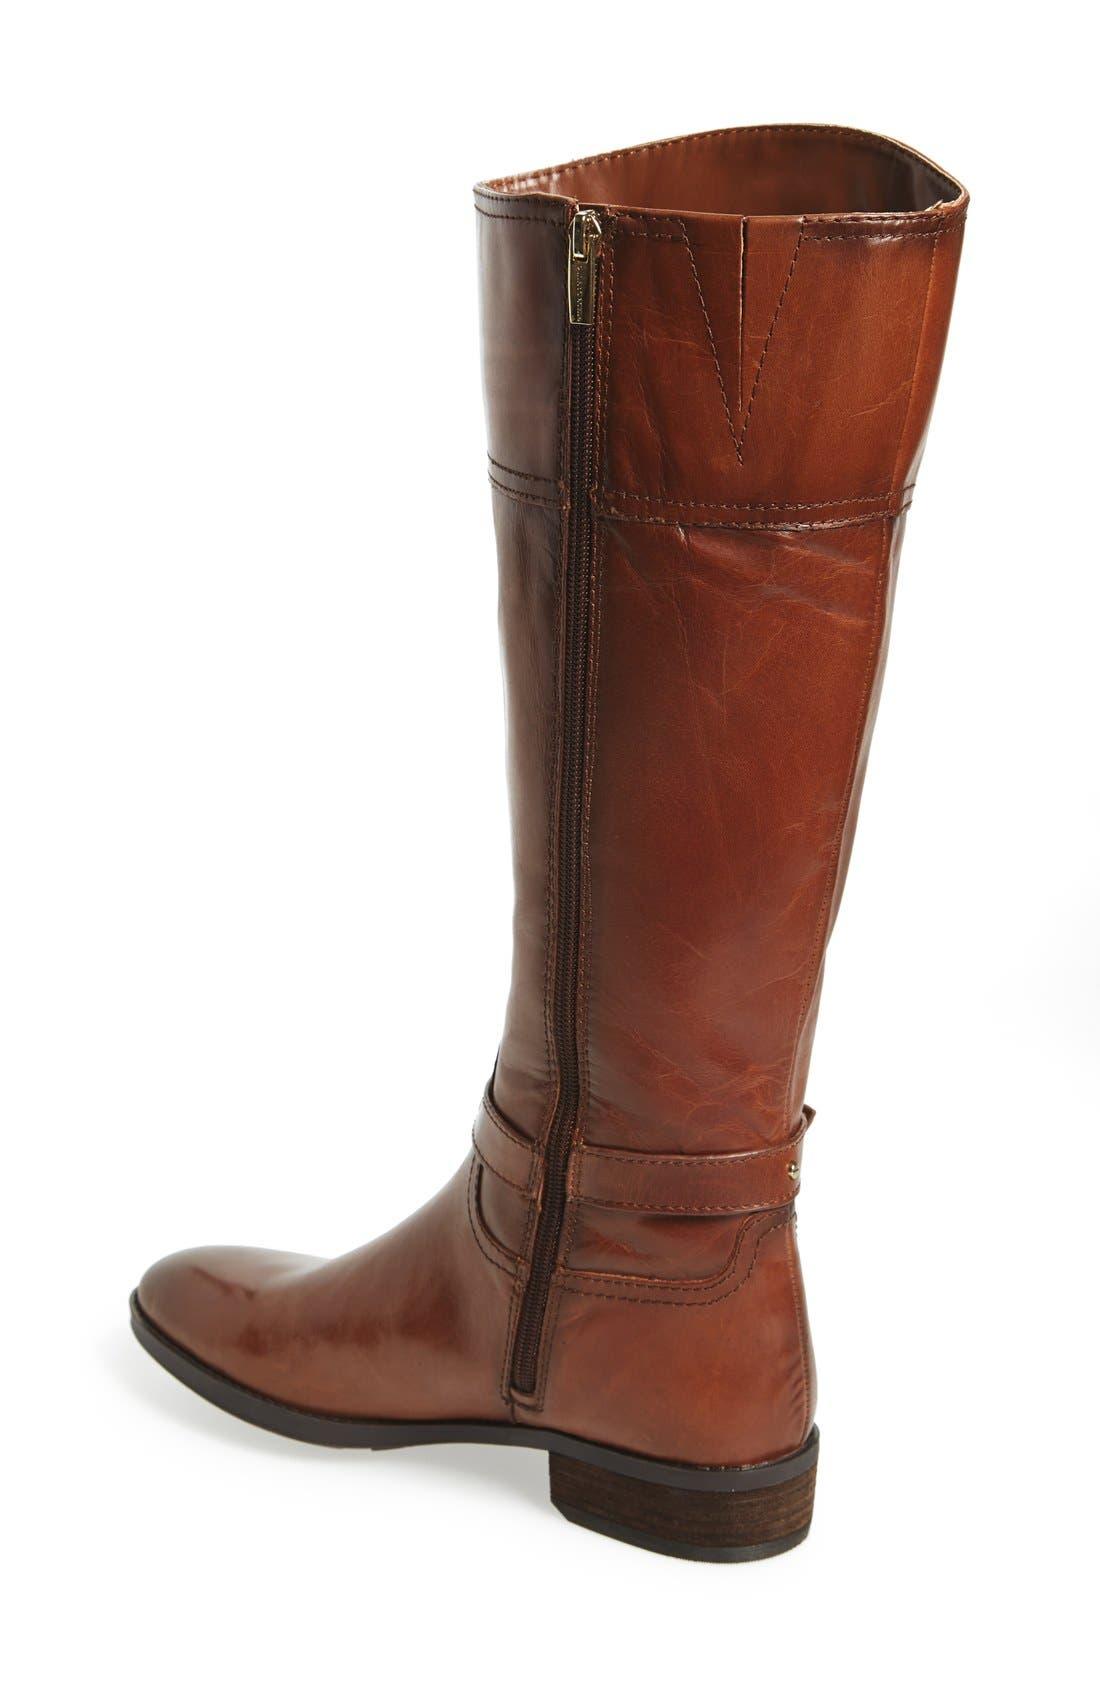 Alternate Image 2  - Vince Camuto 'Phillie' Tall Riding Boot (Women) (Regular & Extended Calf)